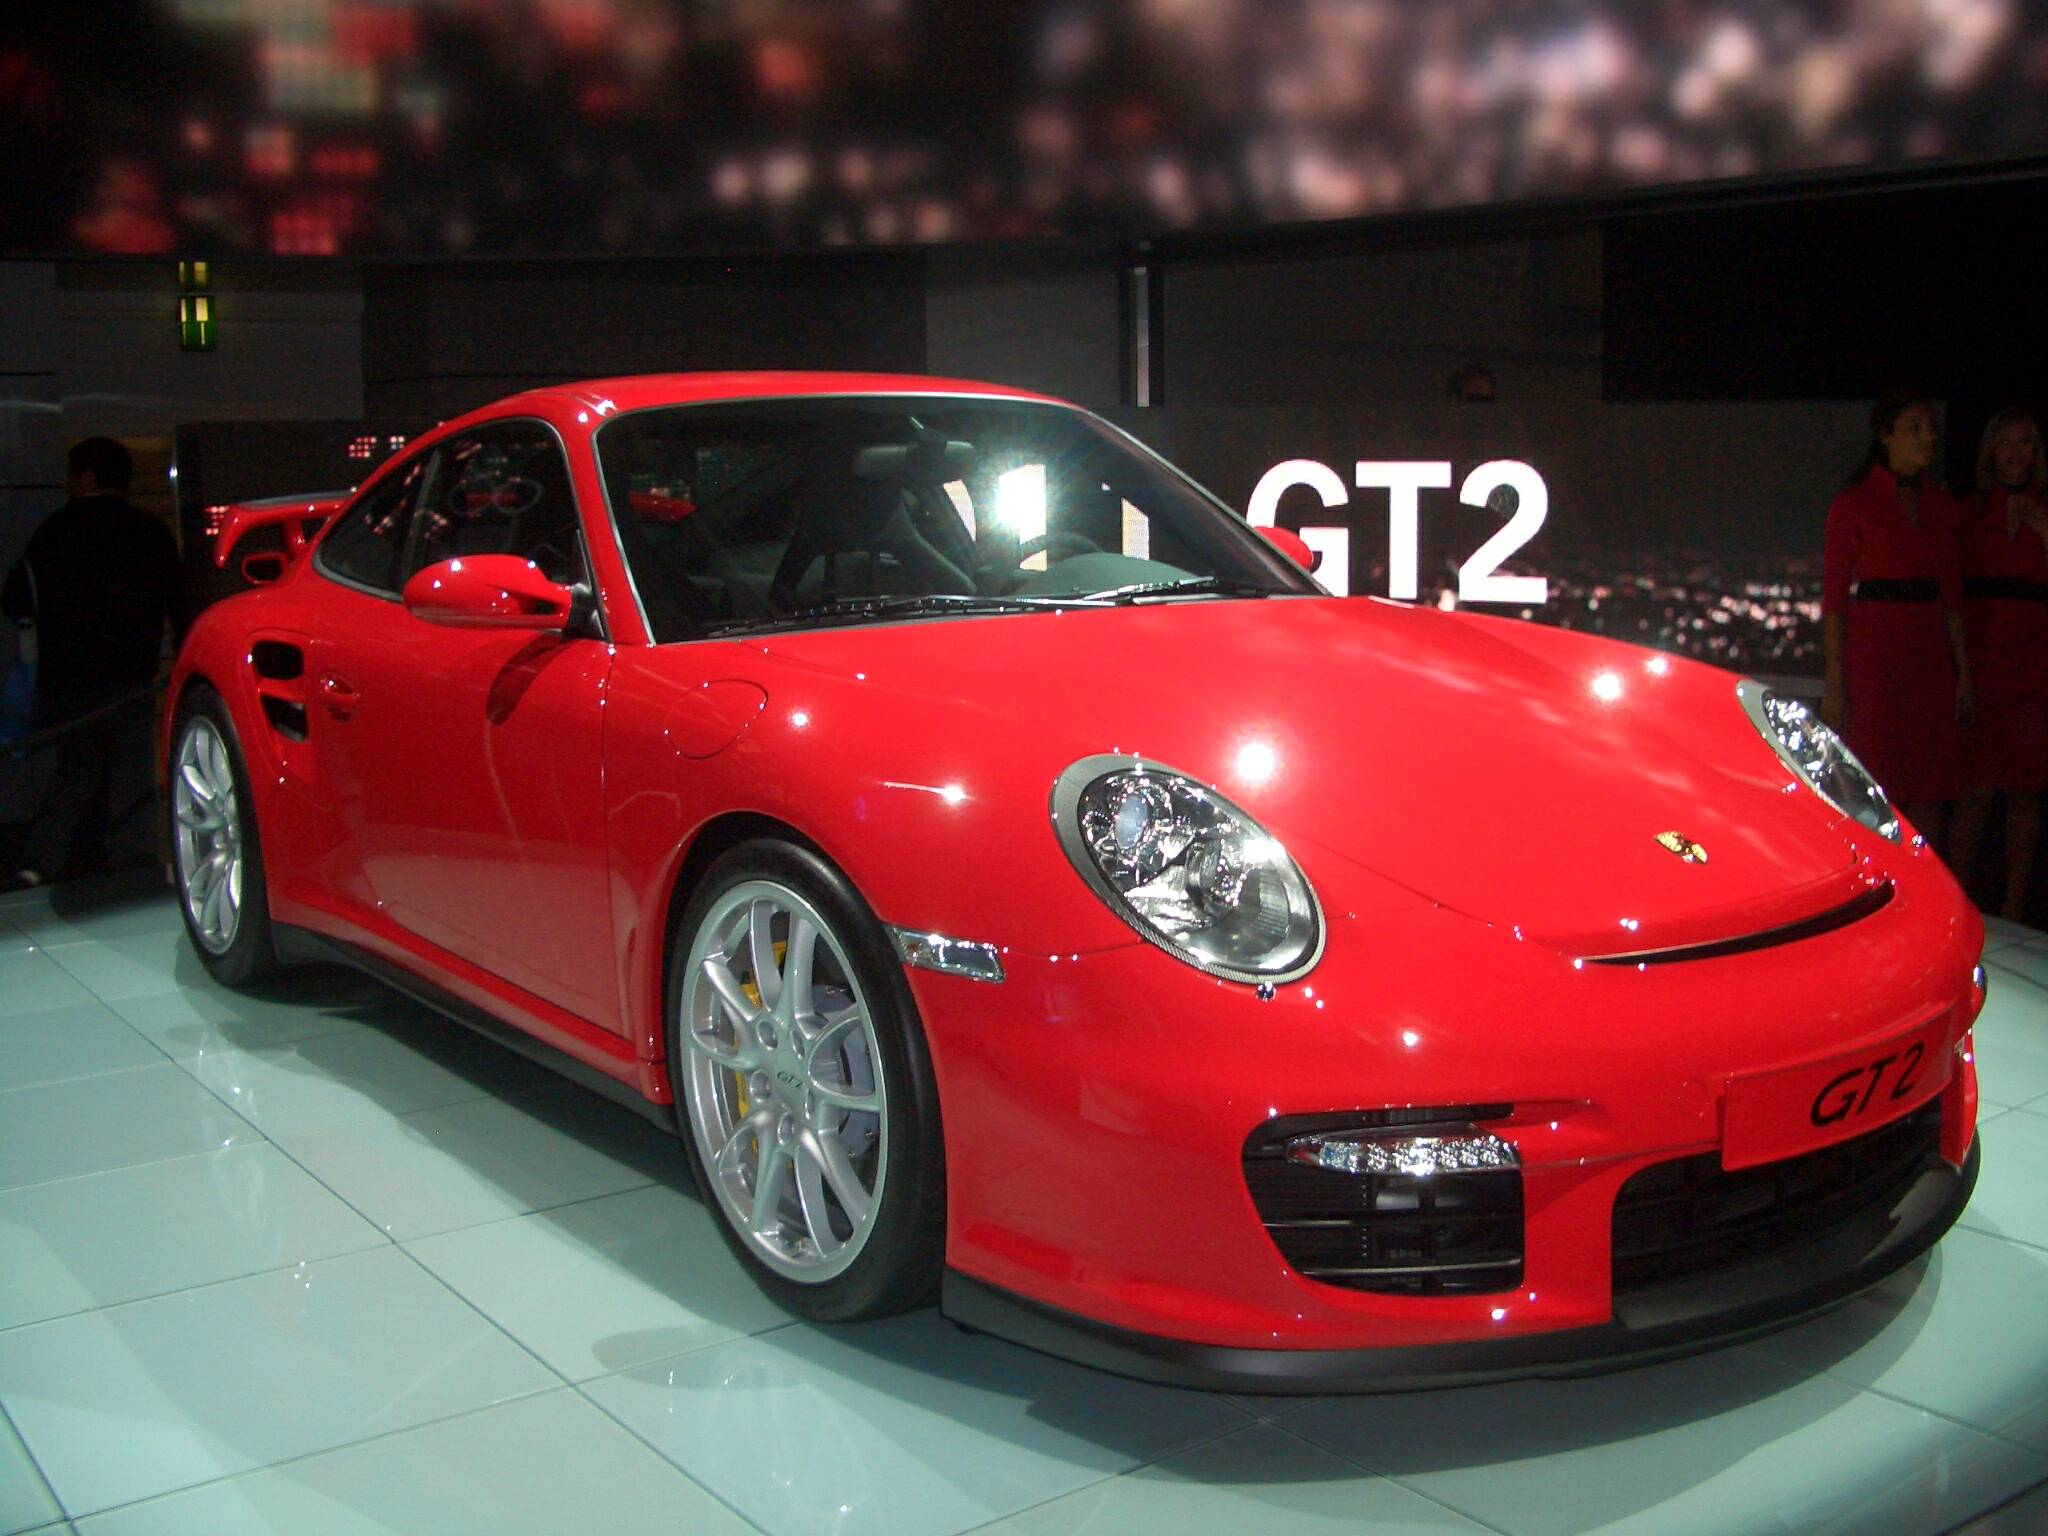 Porsche GT2 Pictures